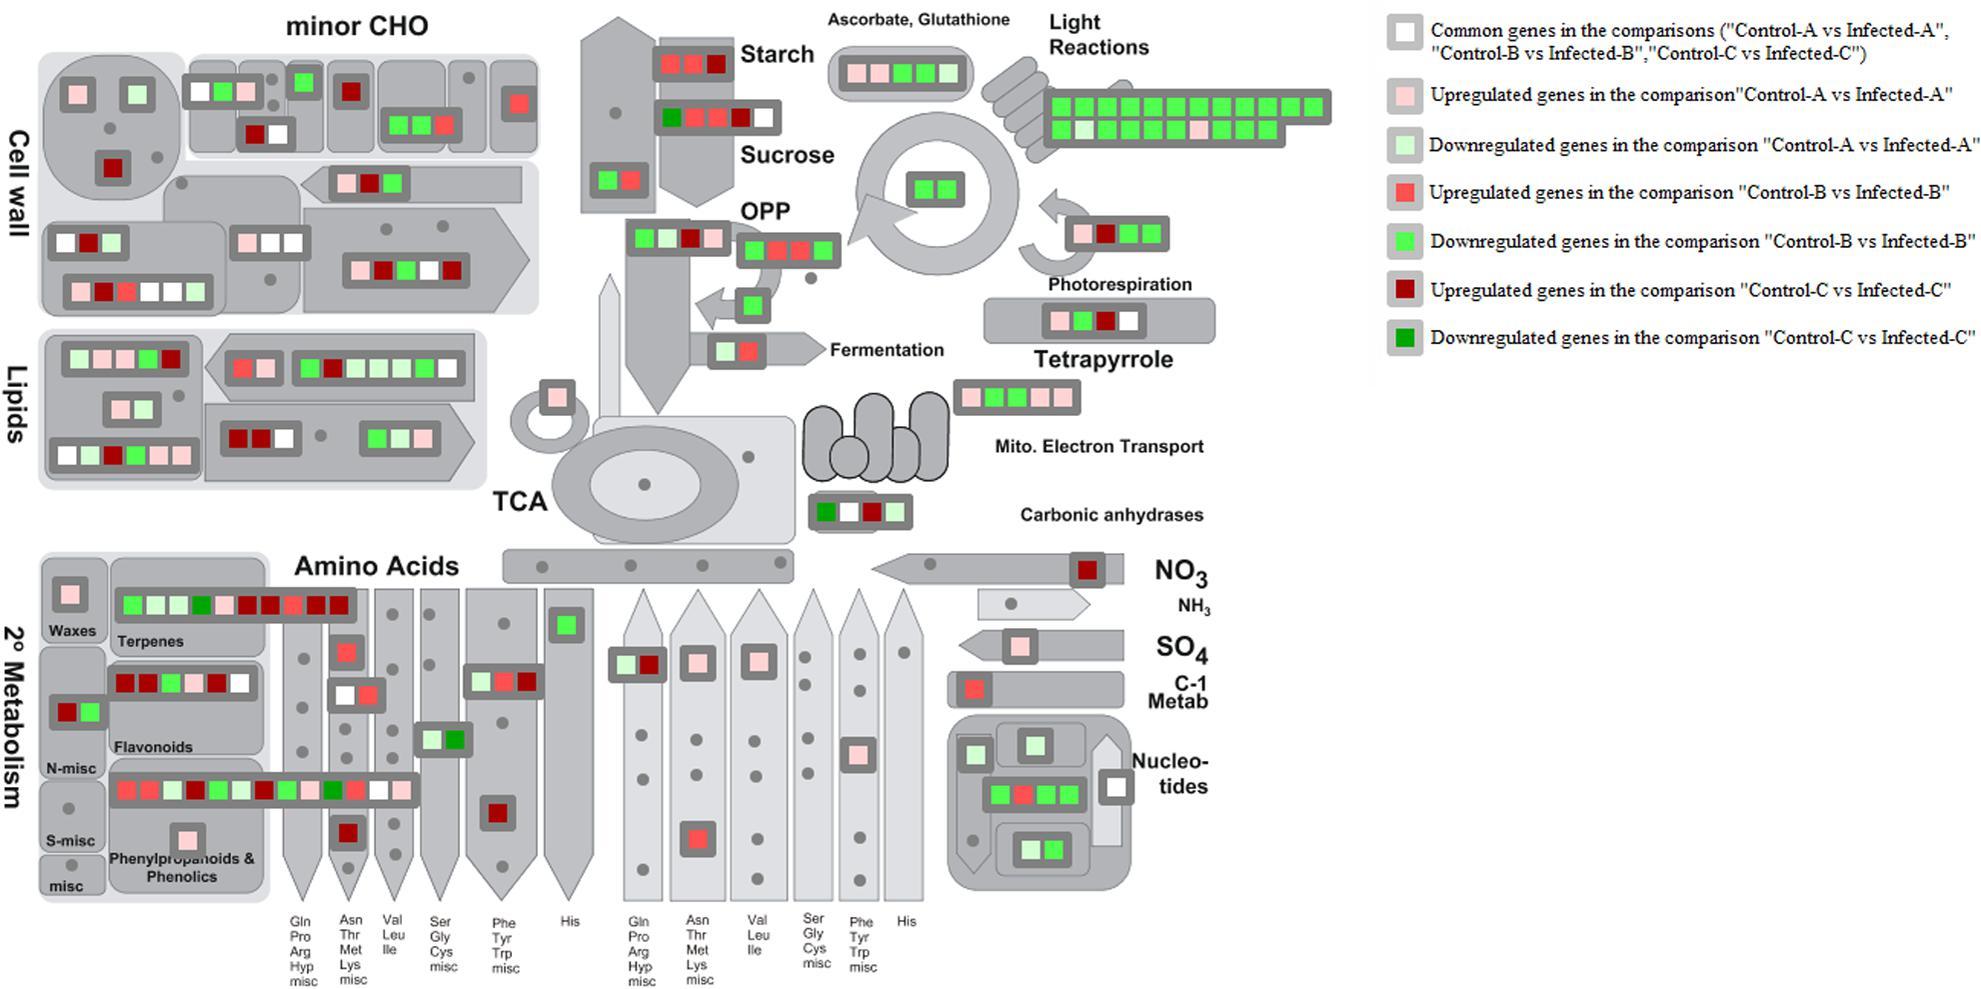 Gene regulatory networks elucidating huanglongbing disease mechanisms